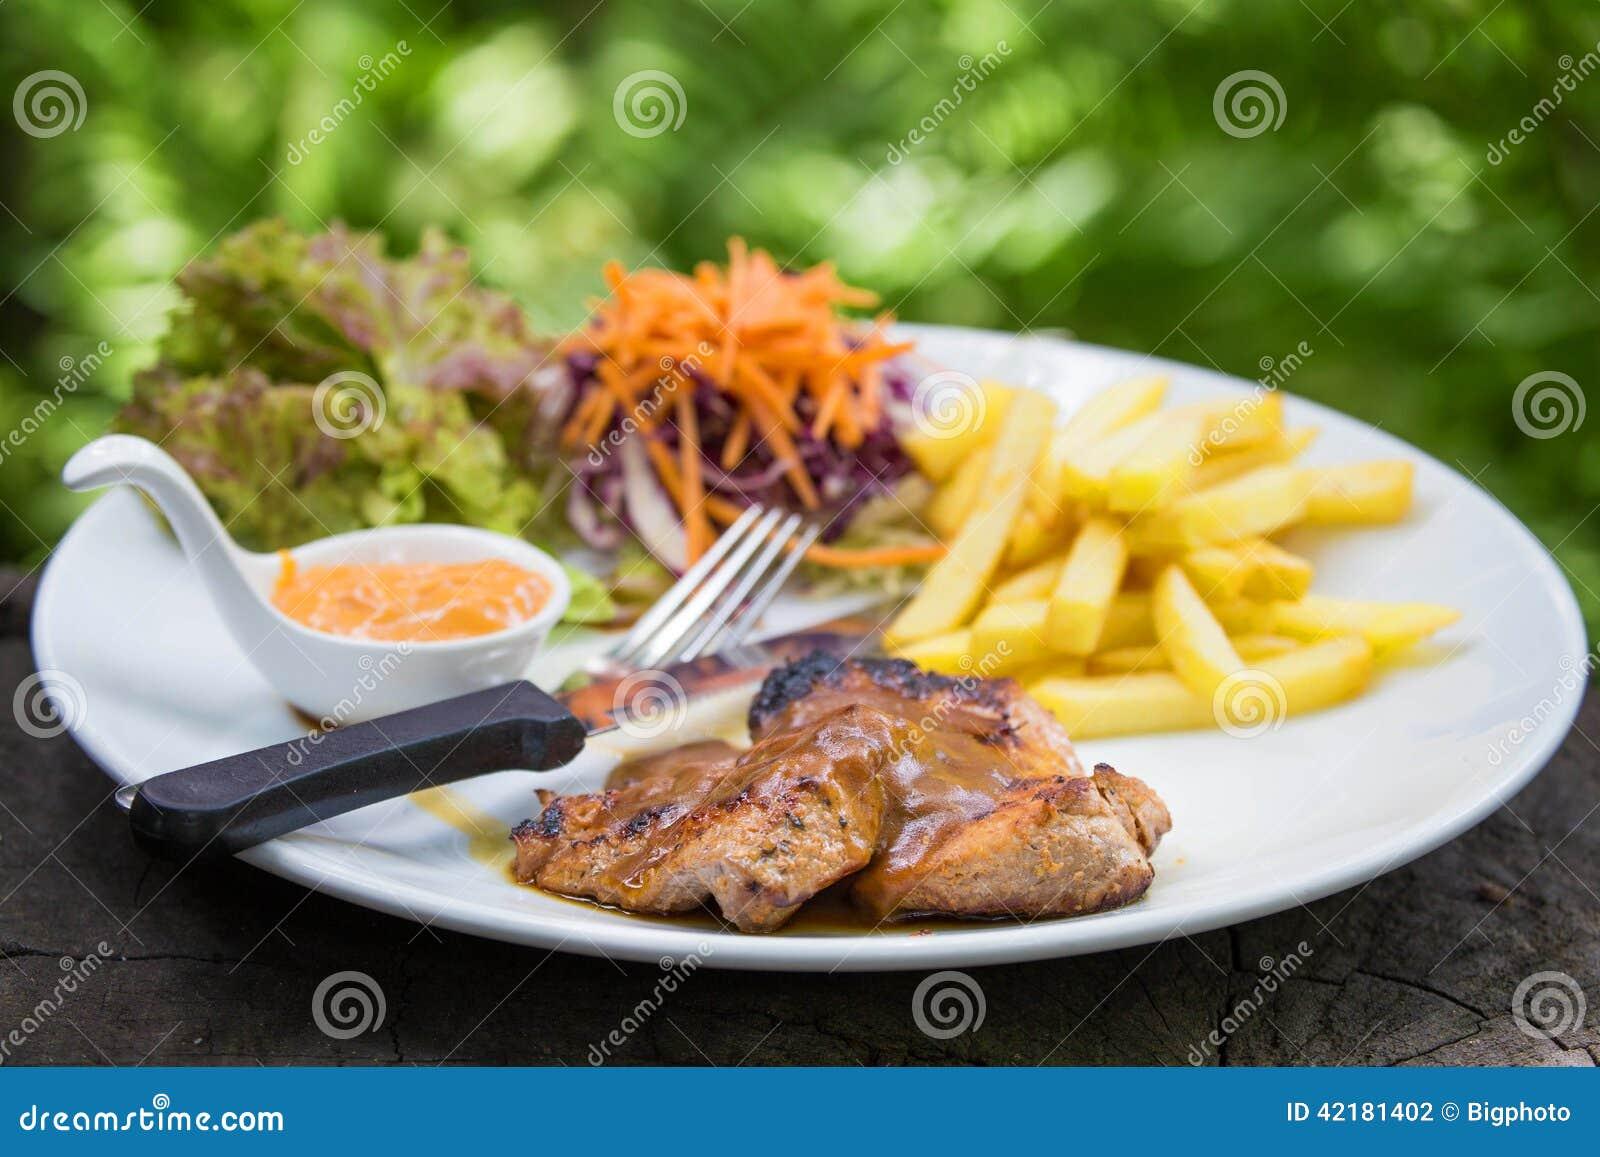 Juicy ψημένη στη σχάρα μπριζόλα χοιρινού κρέατος (λαιμός που κόβεται) με τα πράσινα